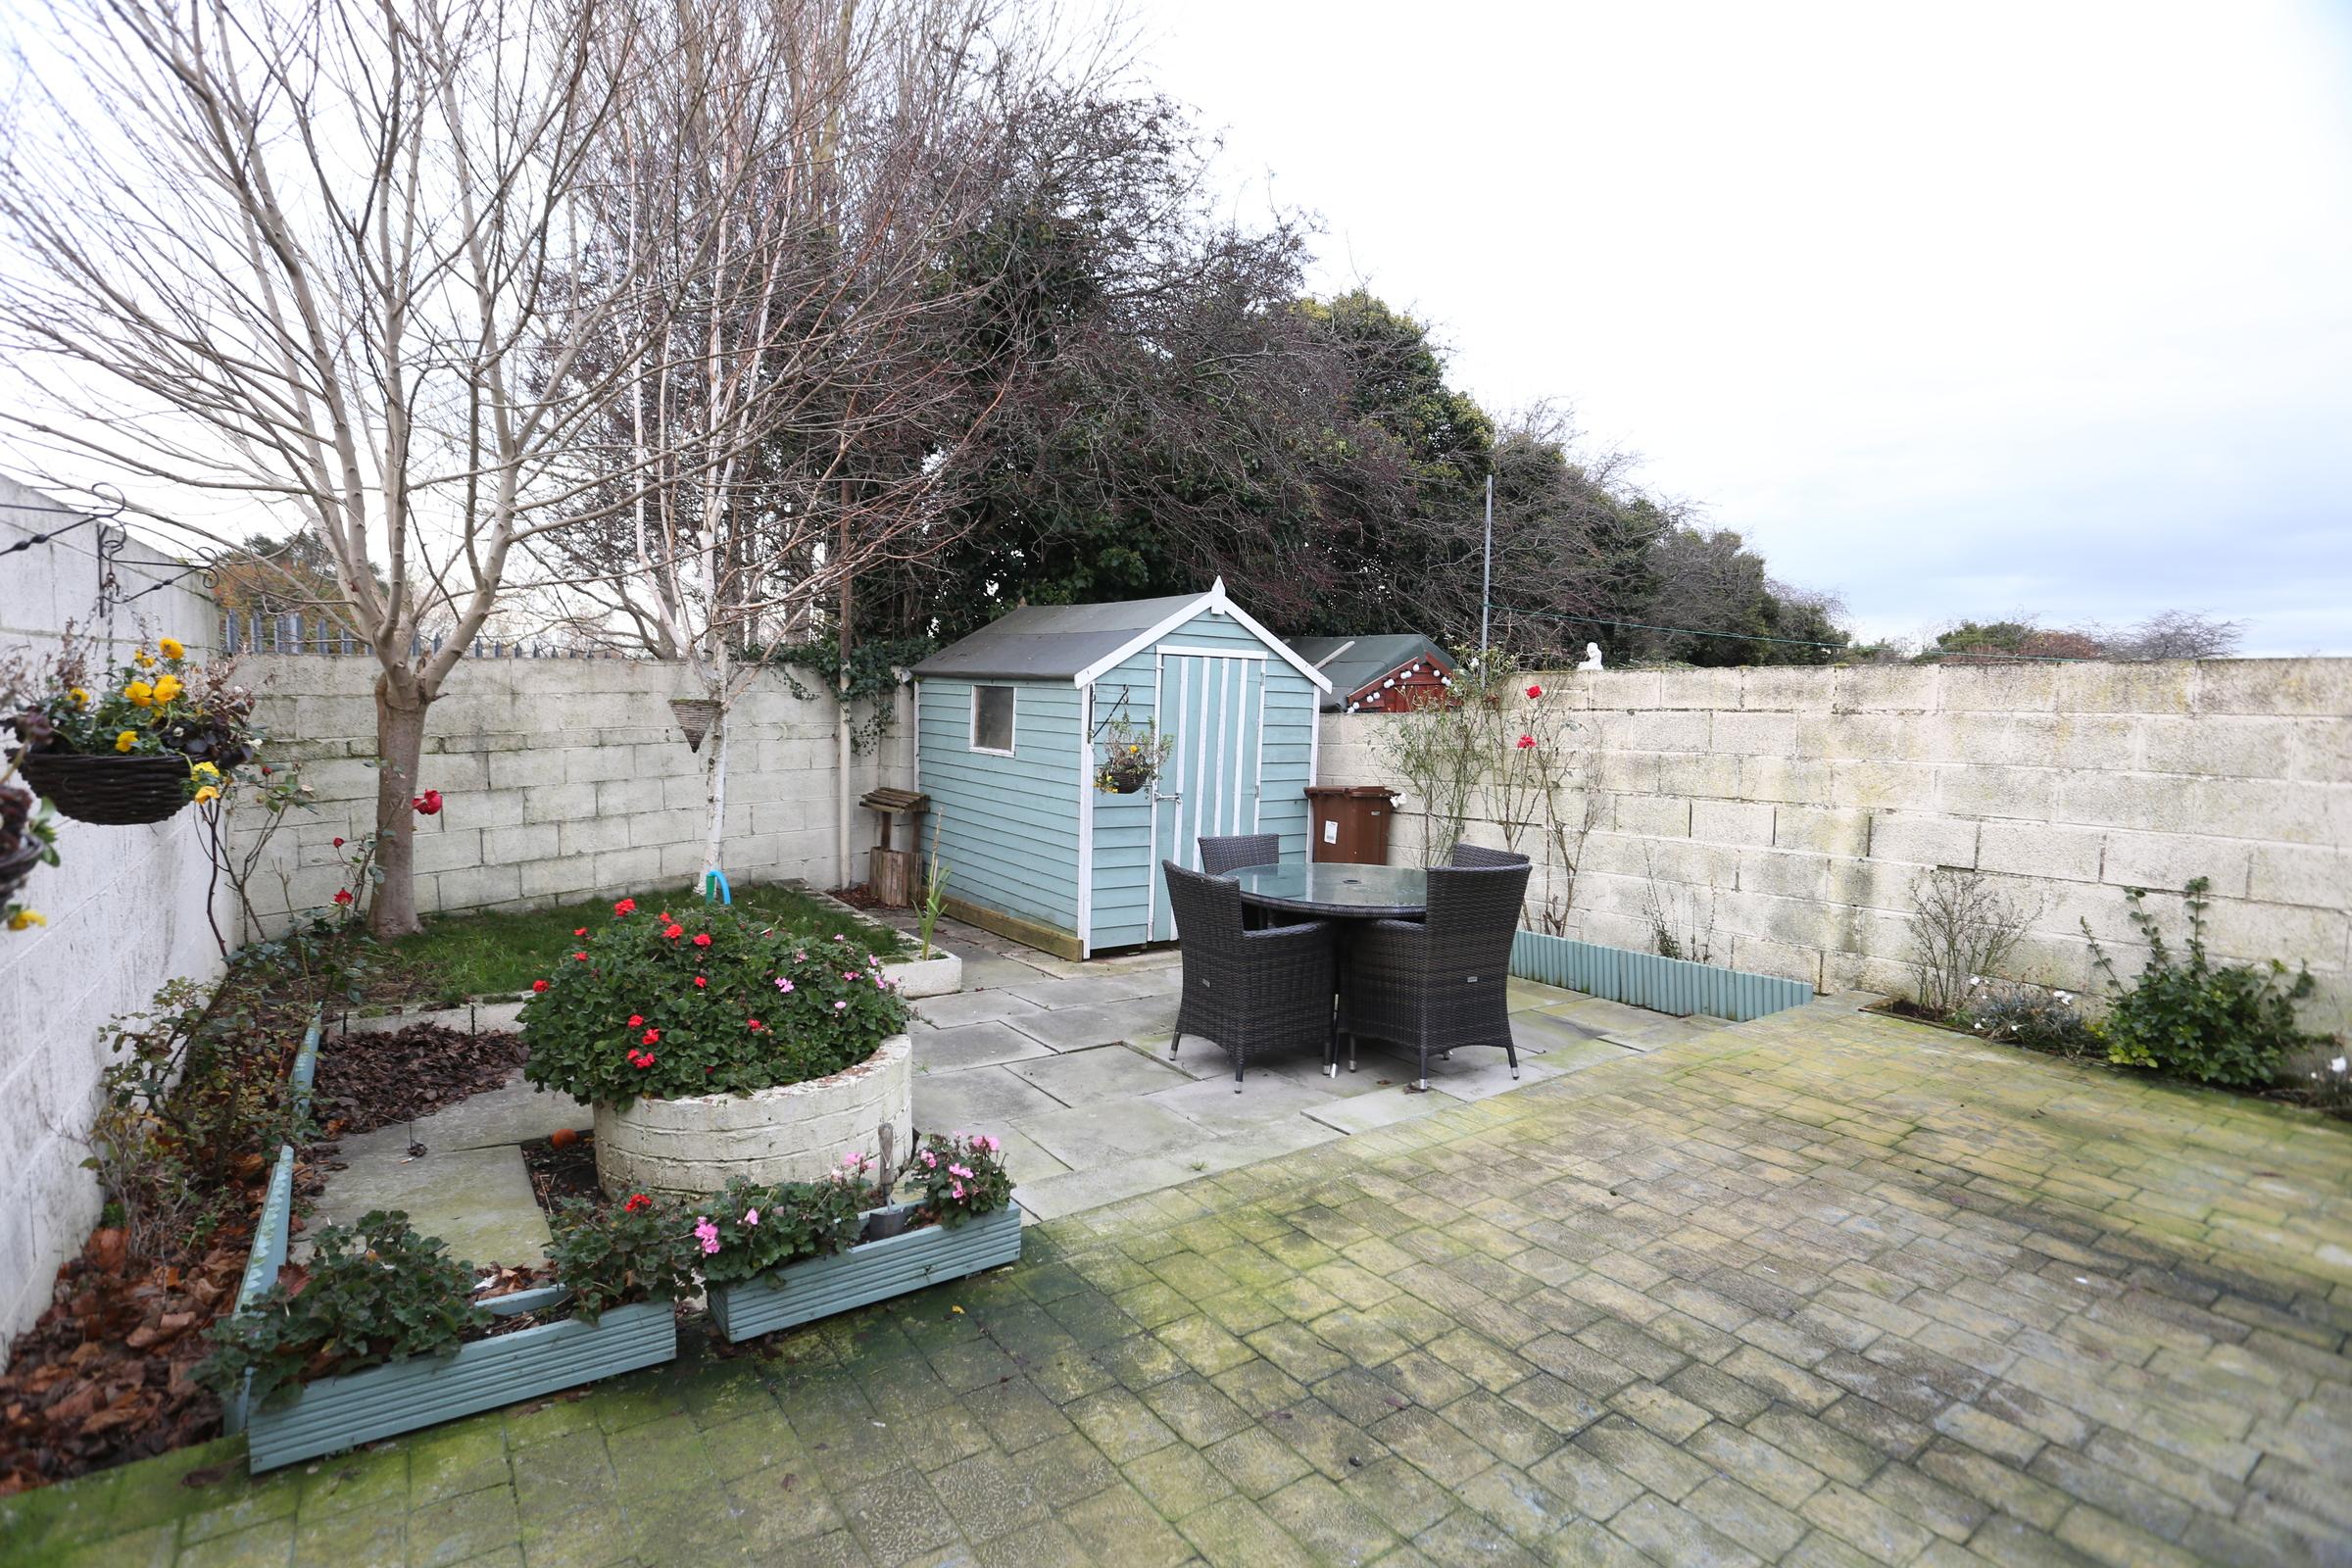 1 Willow Drive, Greenpark, Clondalkin, Dublin 22